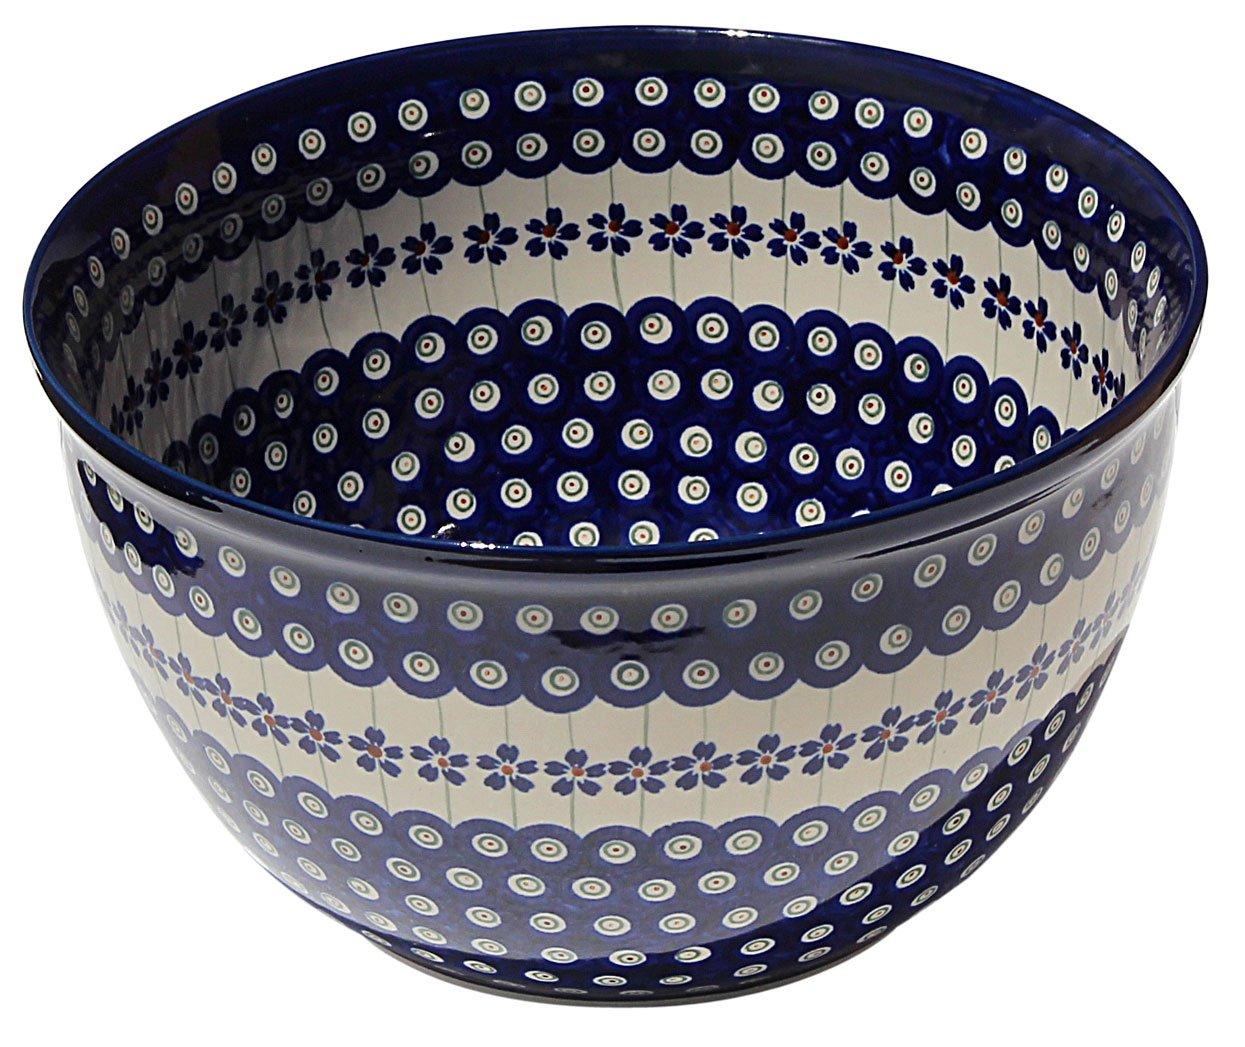 Polish Pottery Mixing Bowl 5 Qt. Decoration Inside From Zaklady Ceramiczne Boleslawiec #986/1-166a Floral Peacock Pattern